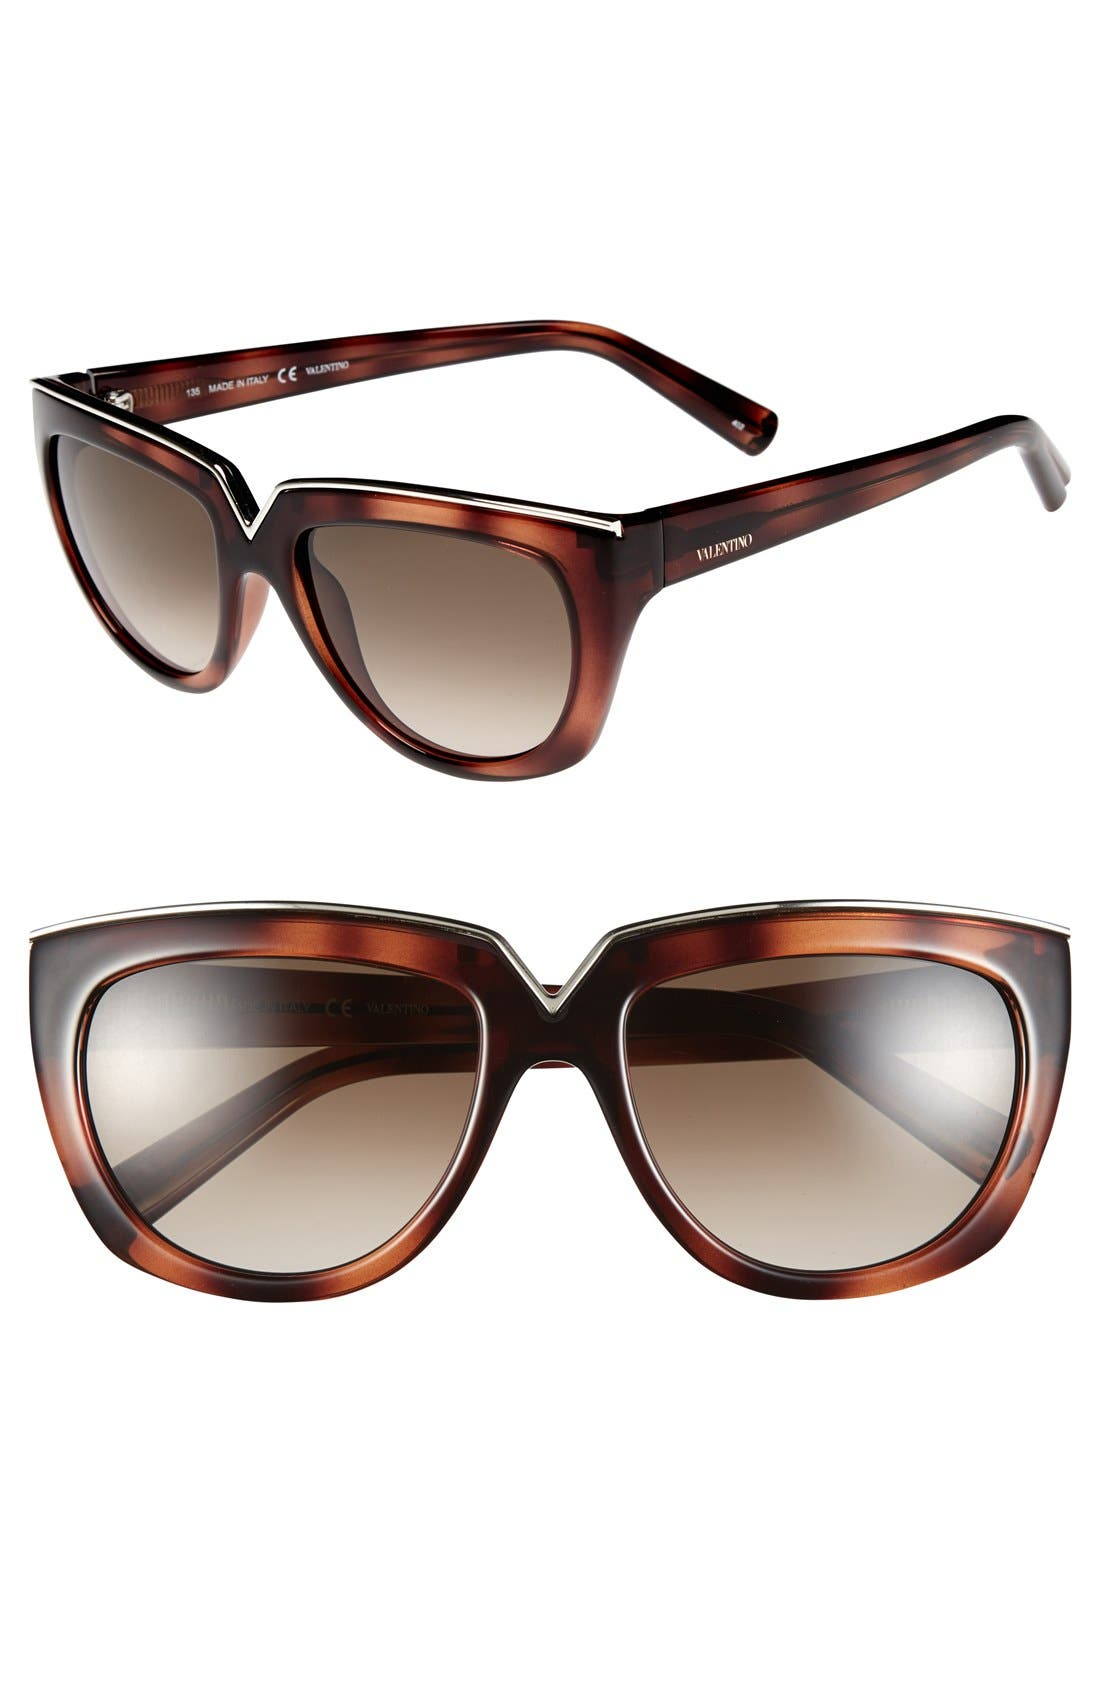 Main Image - Valentino 54mm Gradient Lens Sunglasses